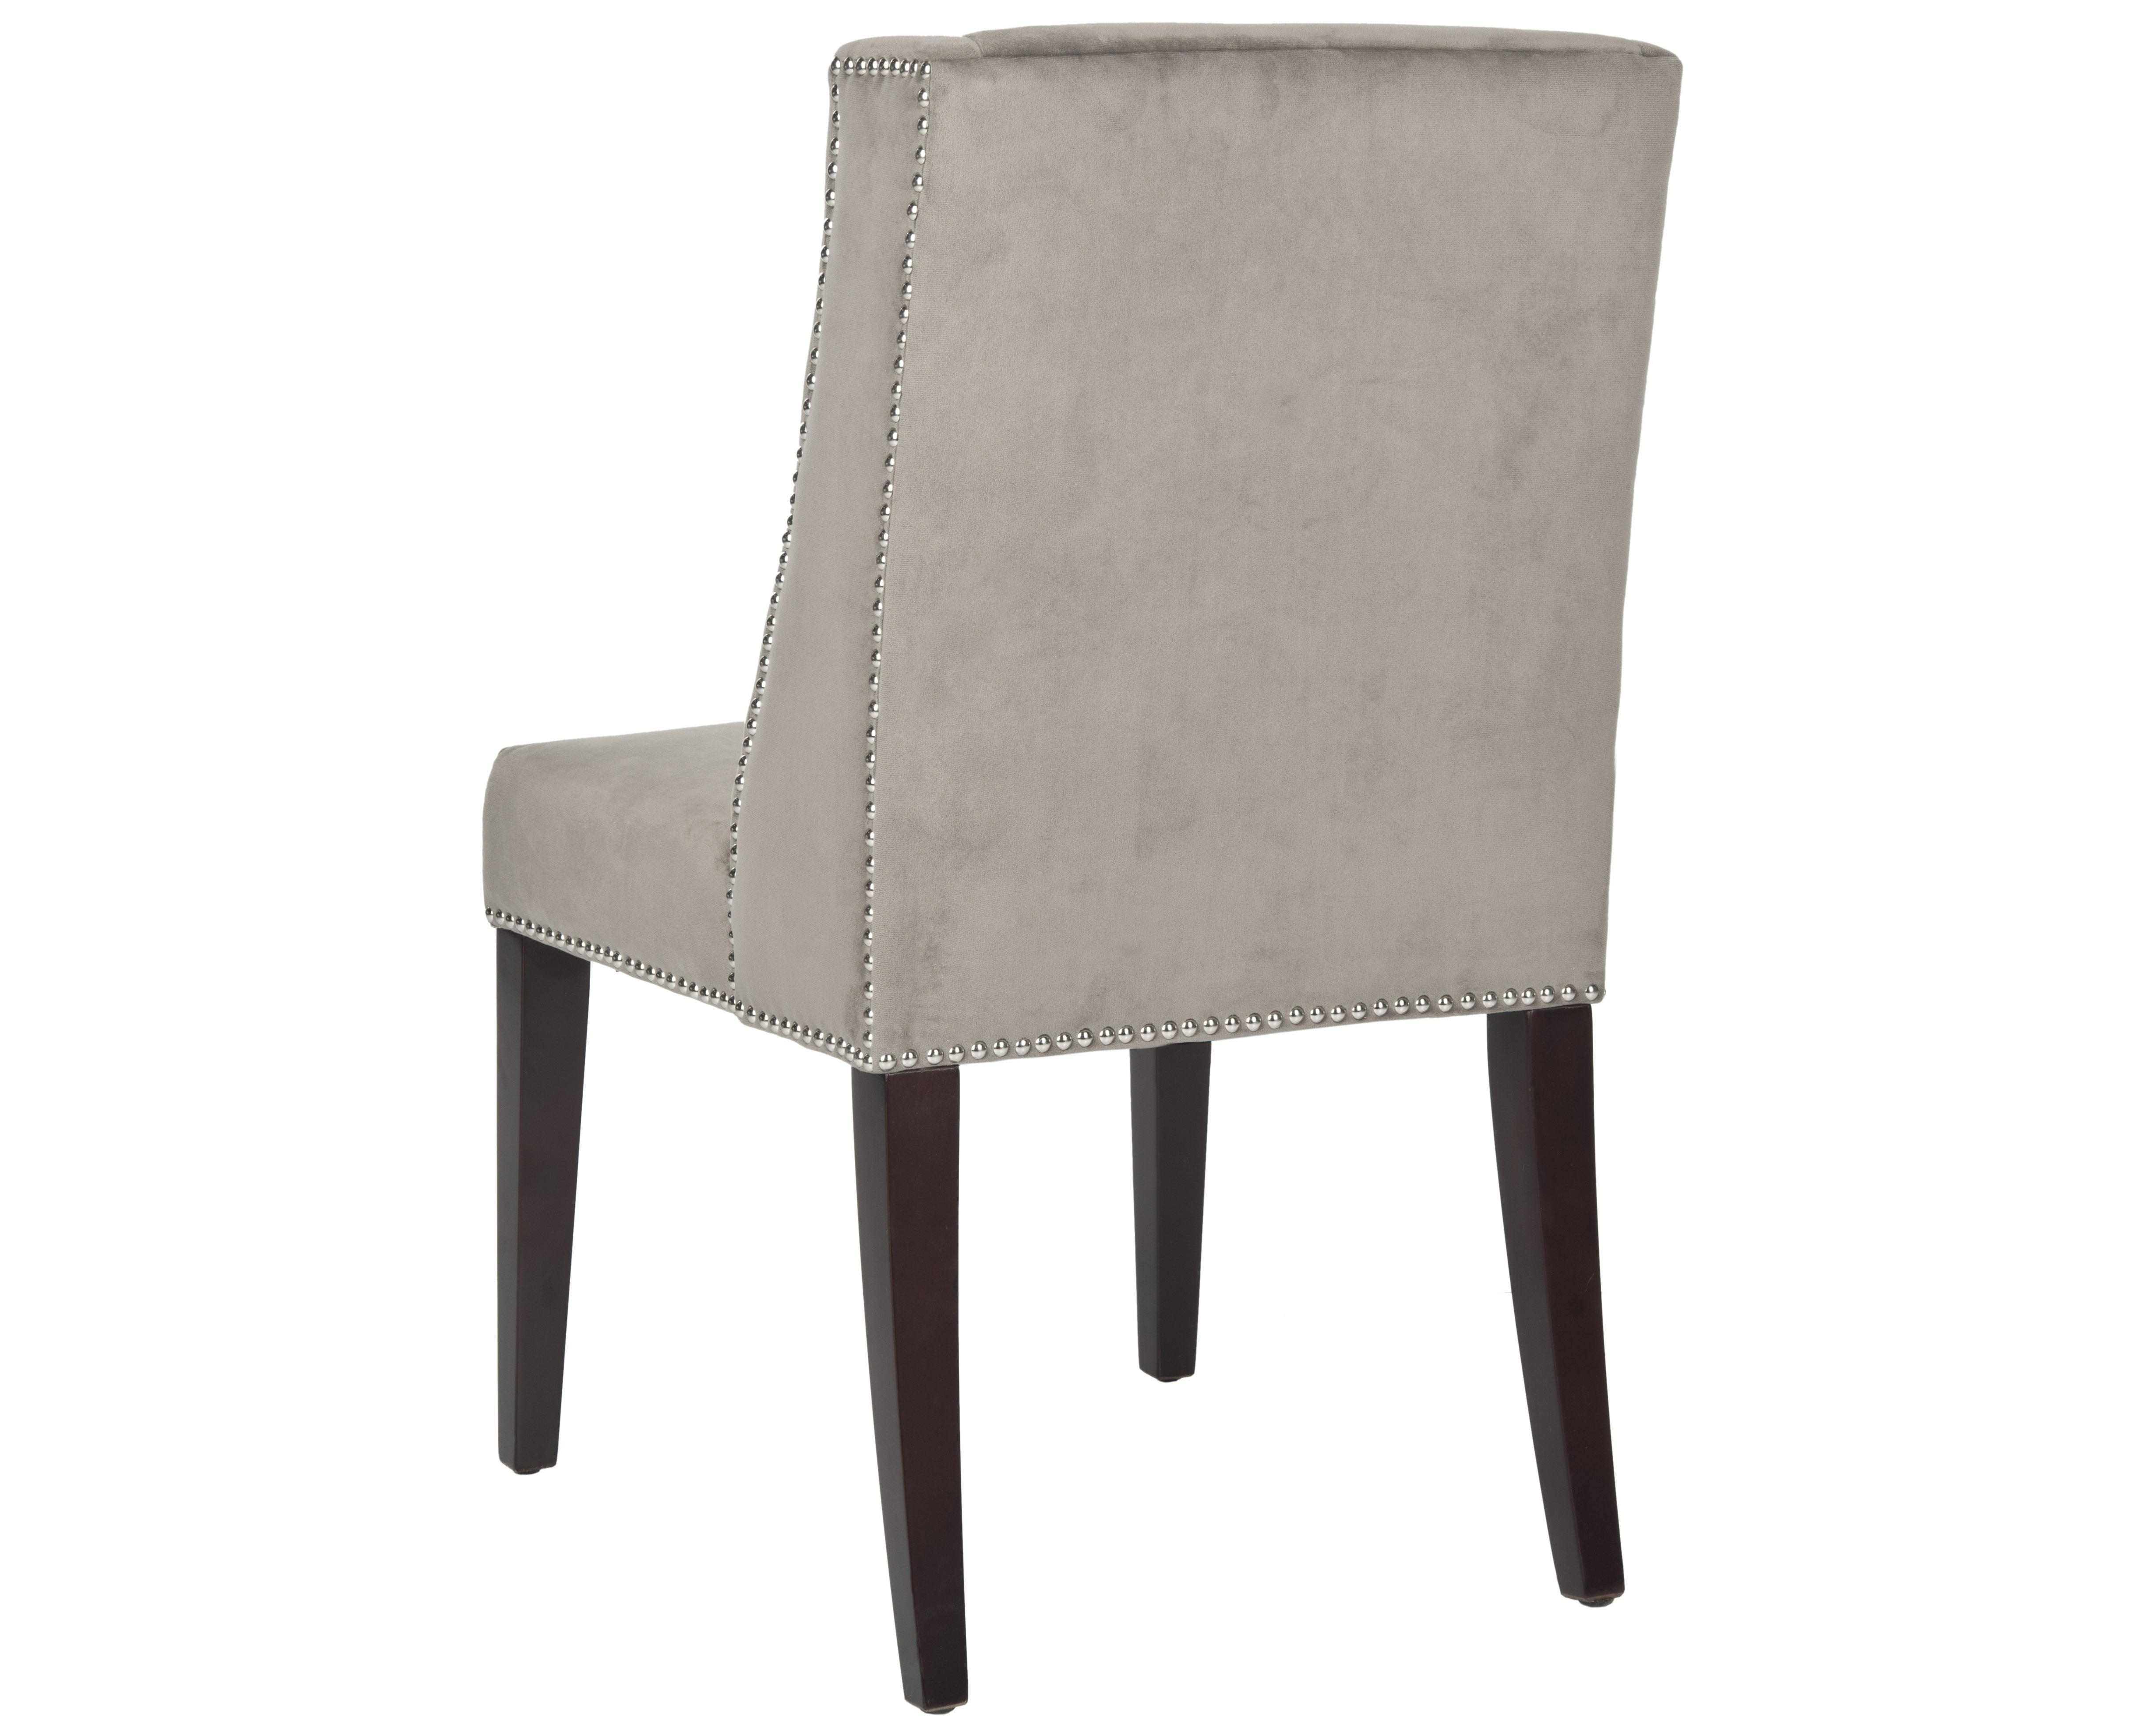 Safavieh Humphry Dining Chair Set Mushroom